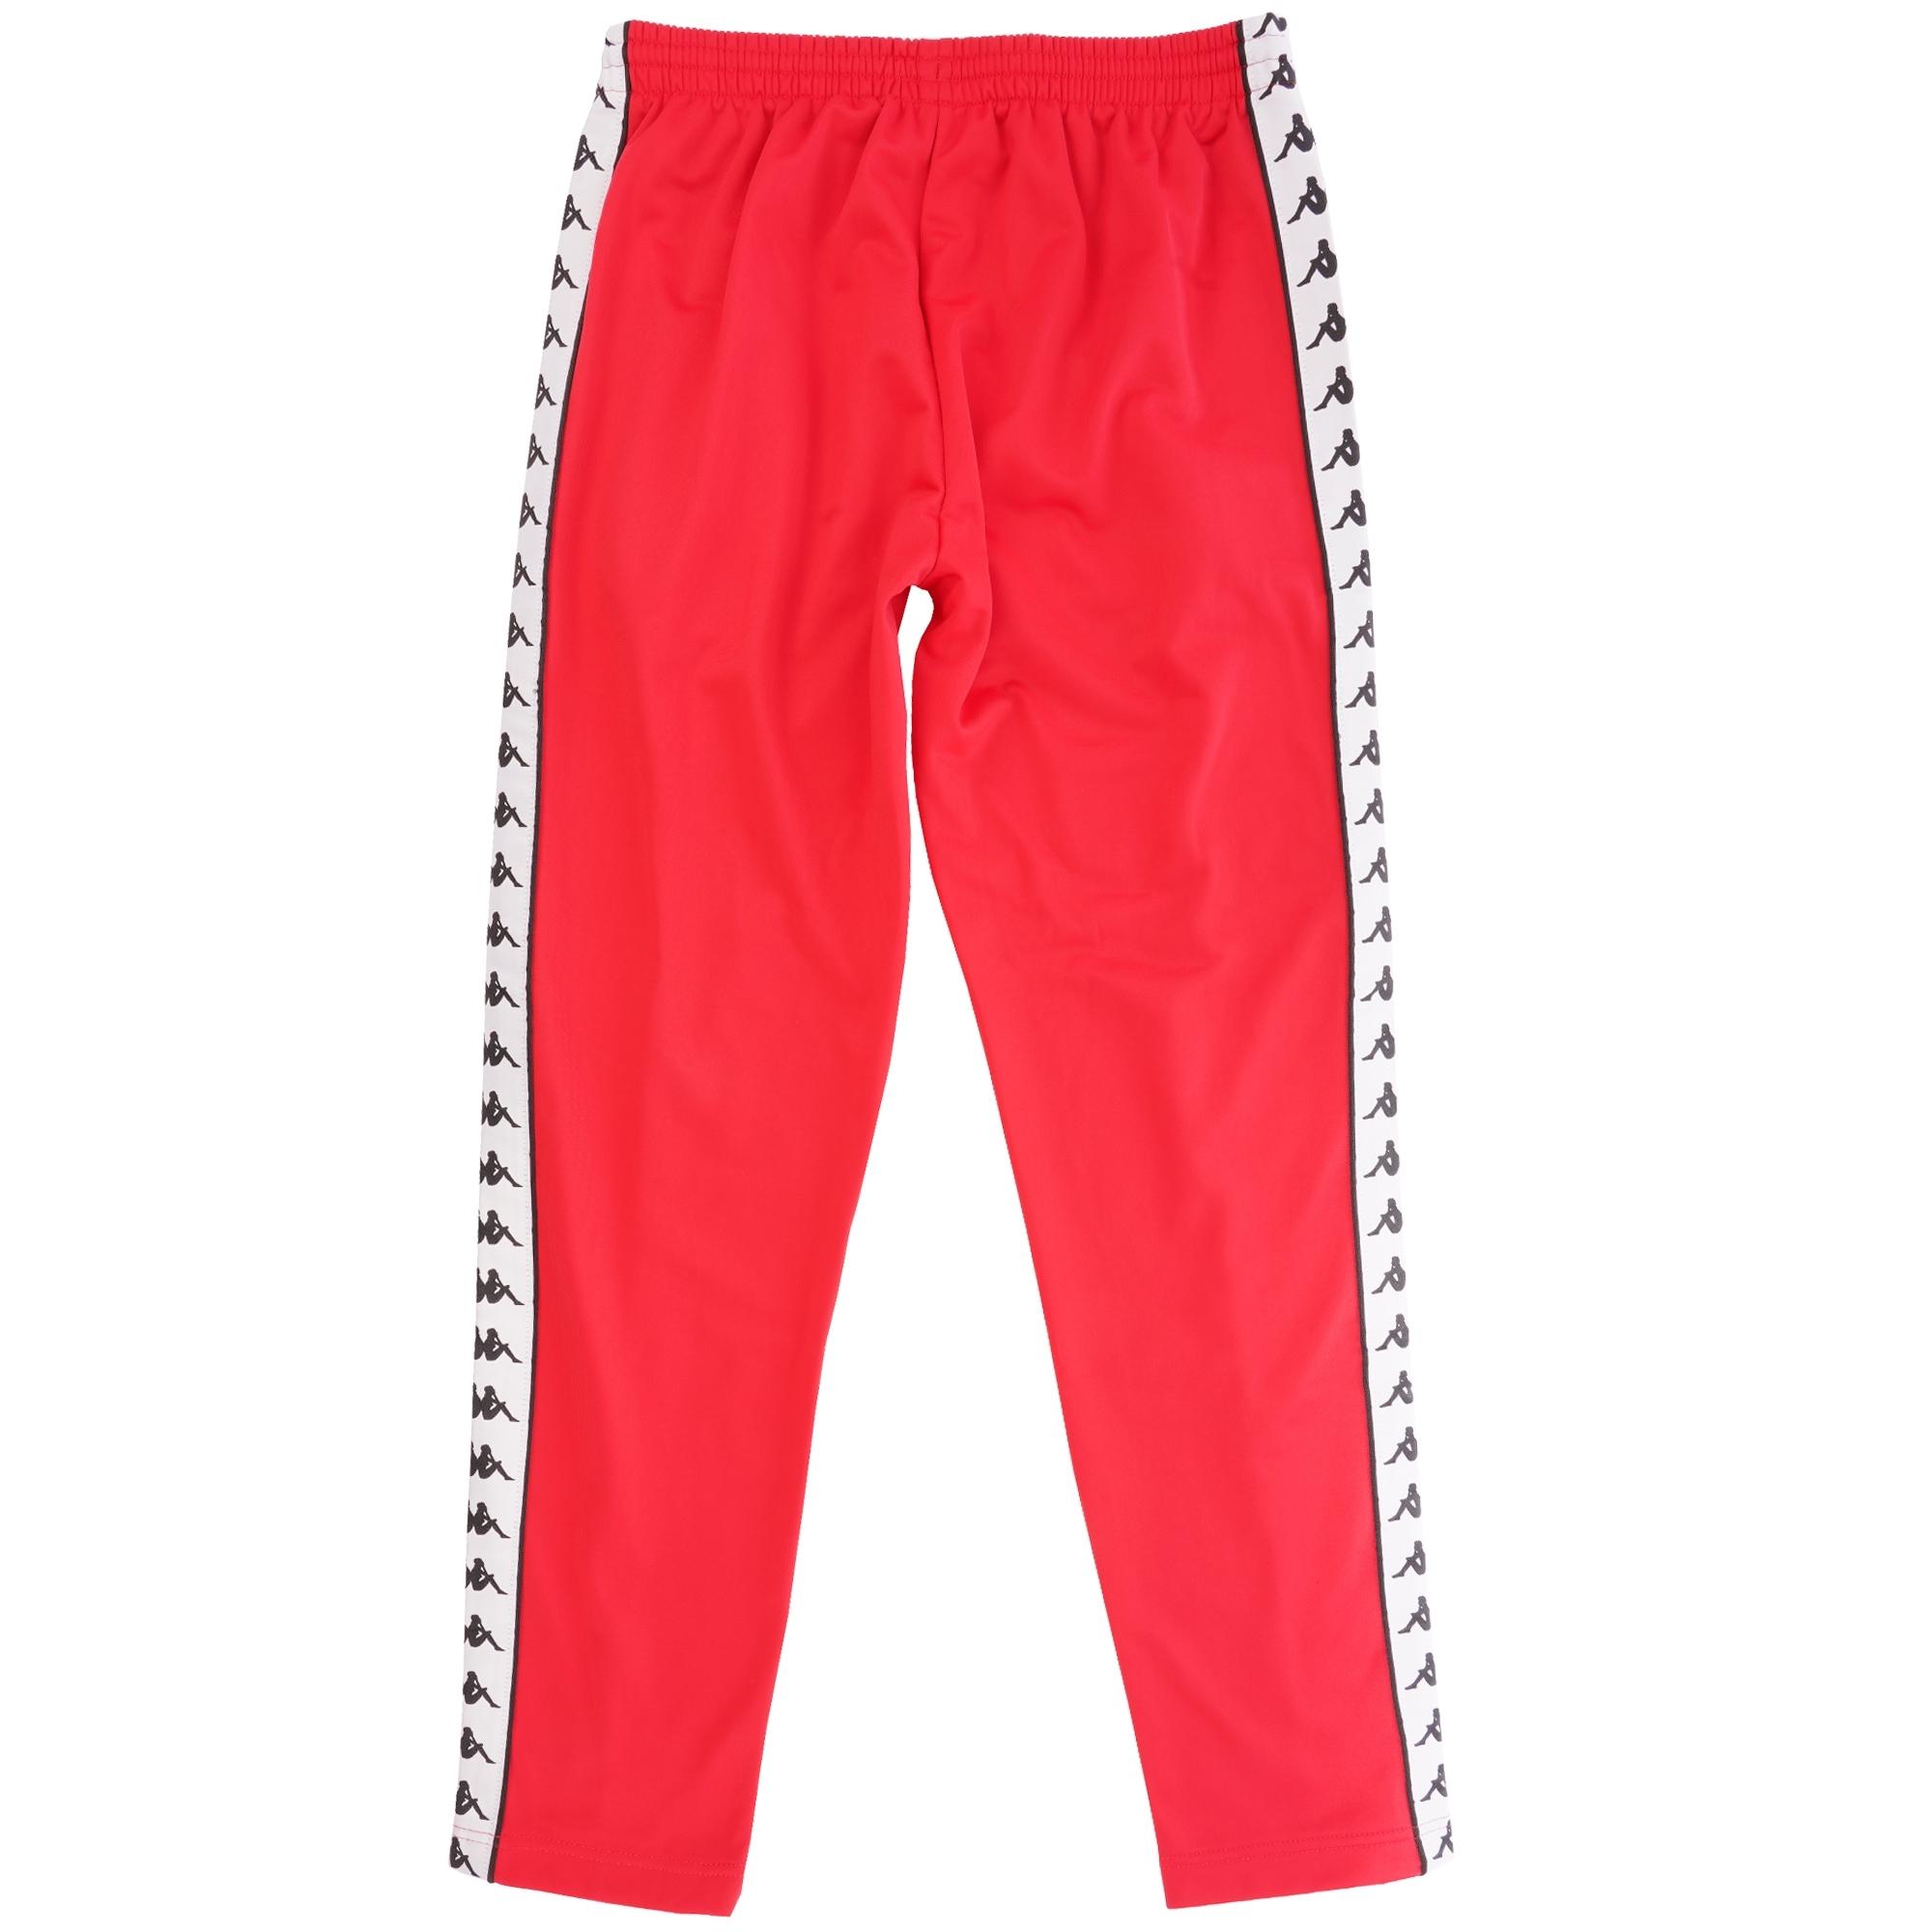 d5e4b0ecf8 222 Banda Astoria Slim Track Pant - Red & Black